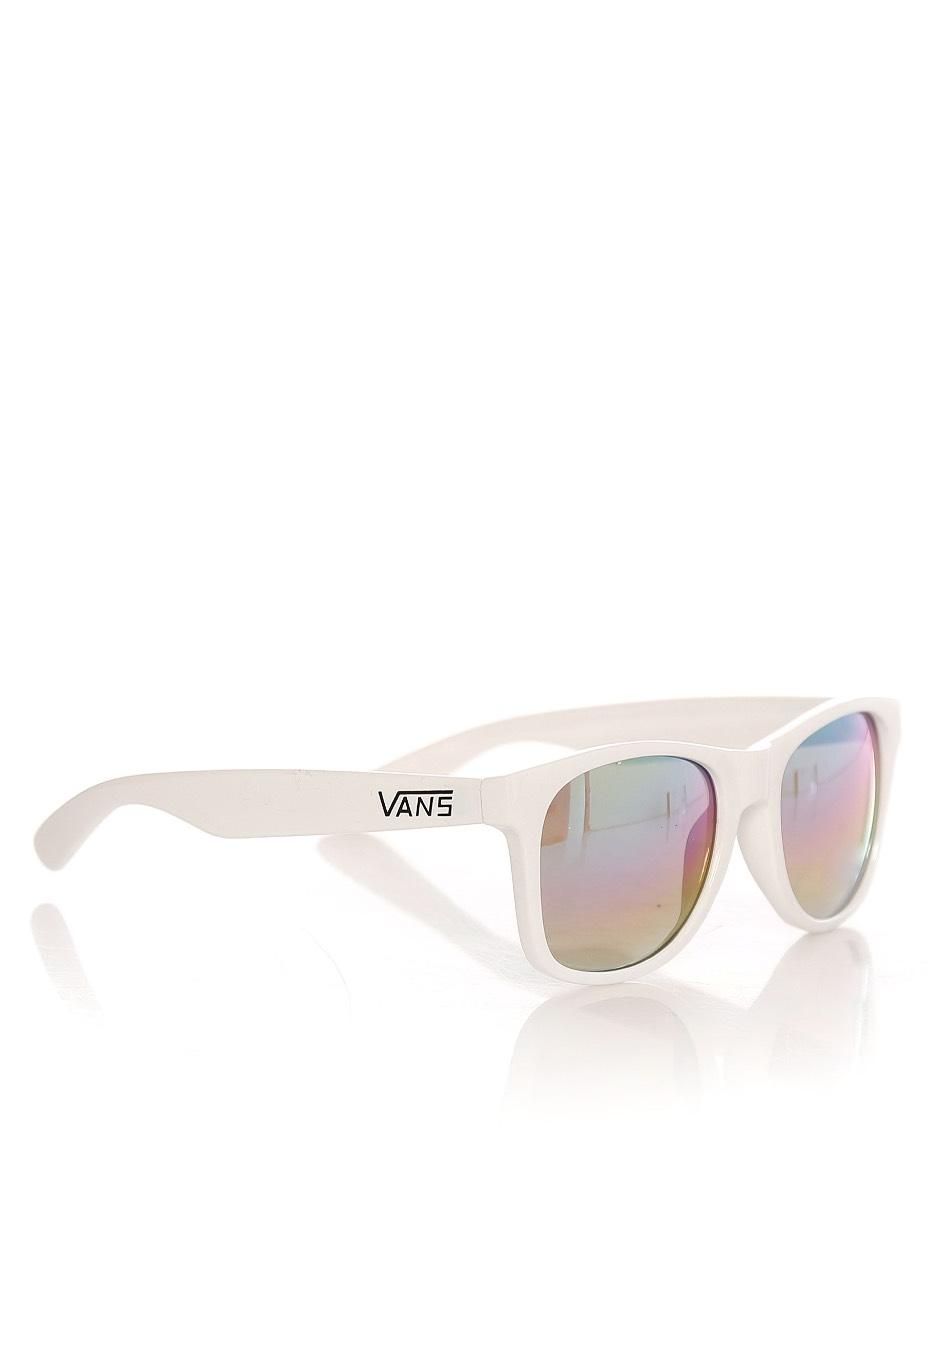 b1197a74b8cd Vans - Spicoli 4 Shades White/Rainbow Mirror - Sunglasses - Impericon.com UK